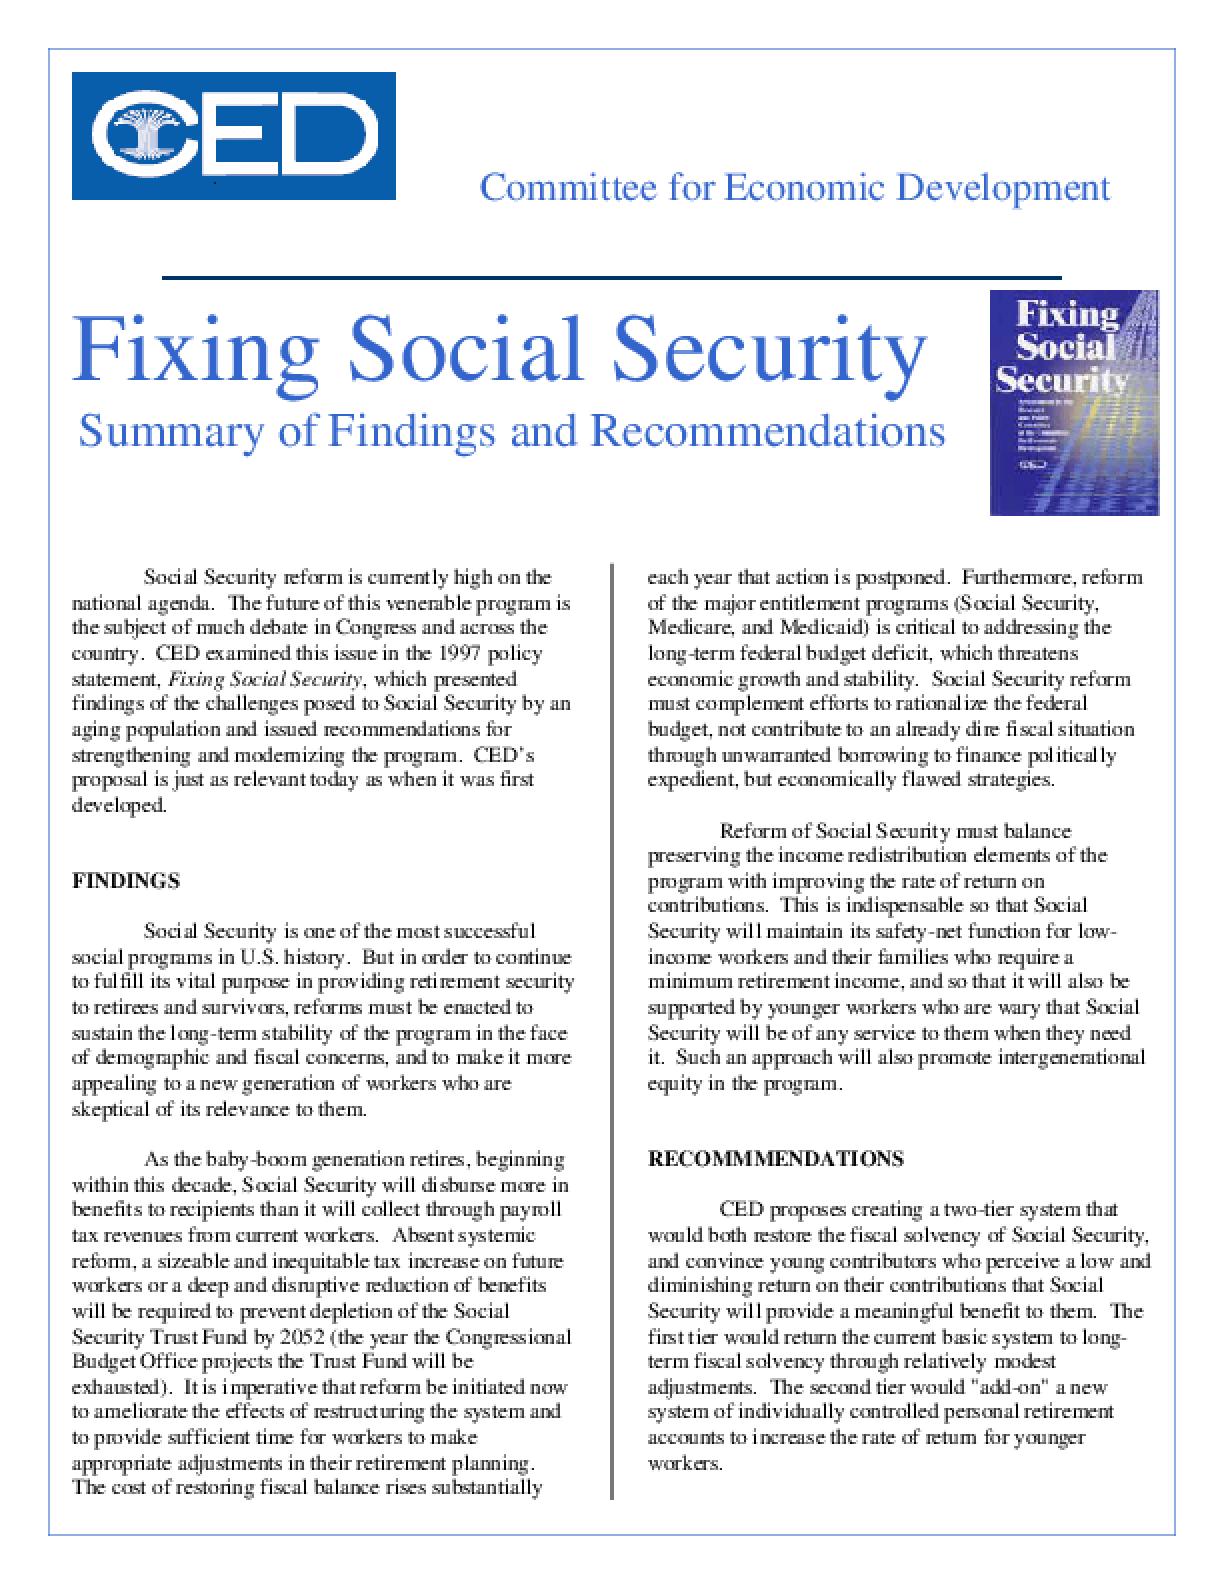 Fixing Social Security - Executive Summary